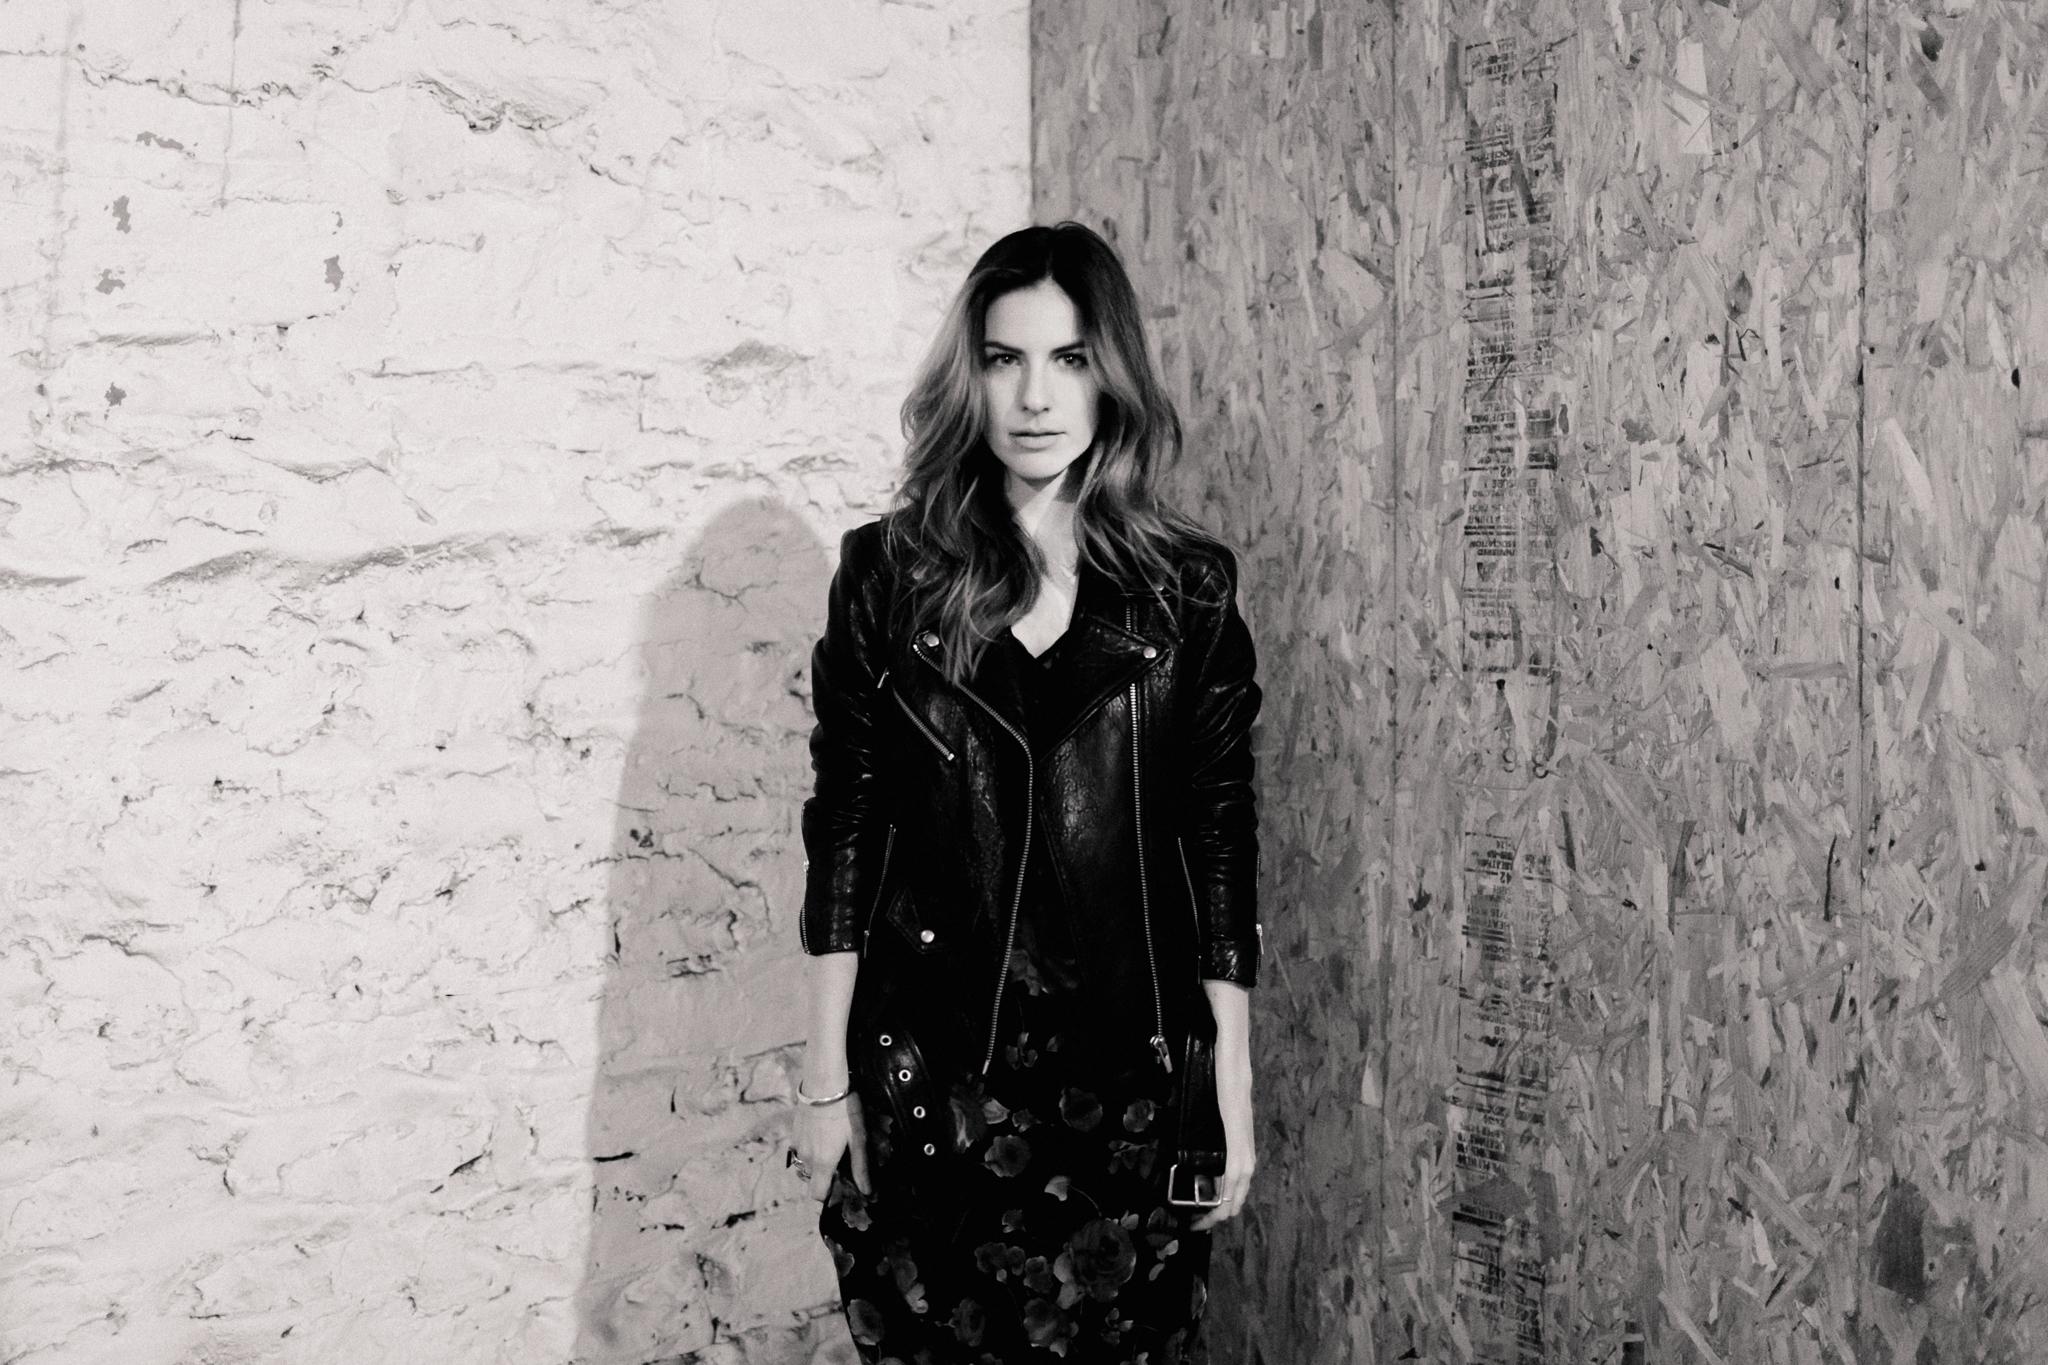 anna_e_cottrell_eldridge_edit_rose_noir_fashion_blogger_vintage_90s_rose maxi_dress_veda_black_leather_jayne_jacket_rag_and_bone_chelsea_boot_styling_mgb_photo_7.jpg